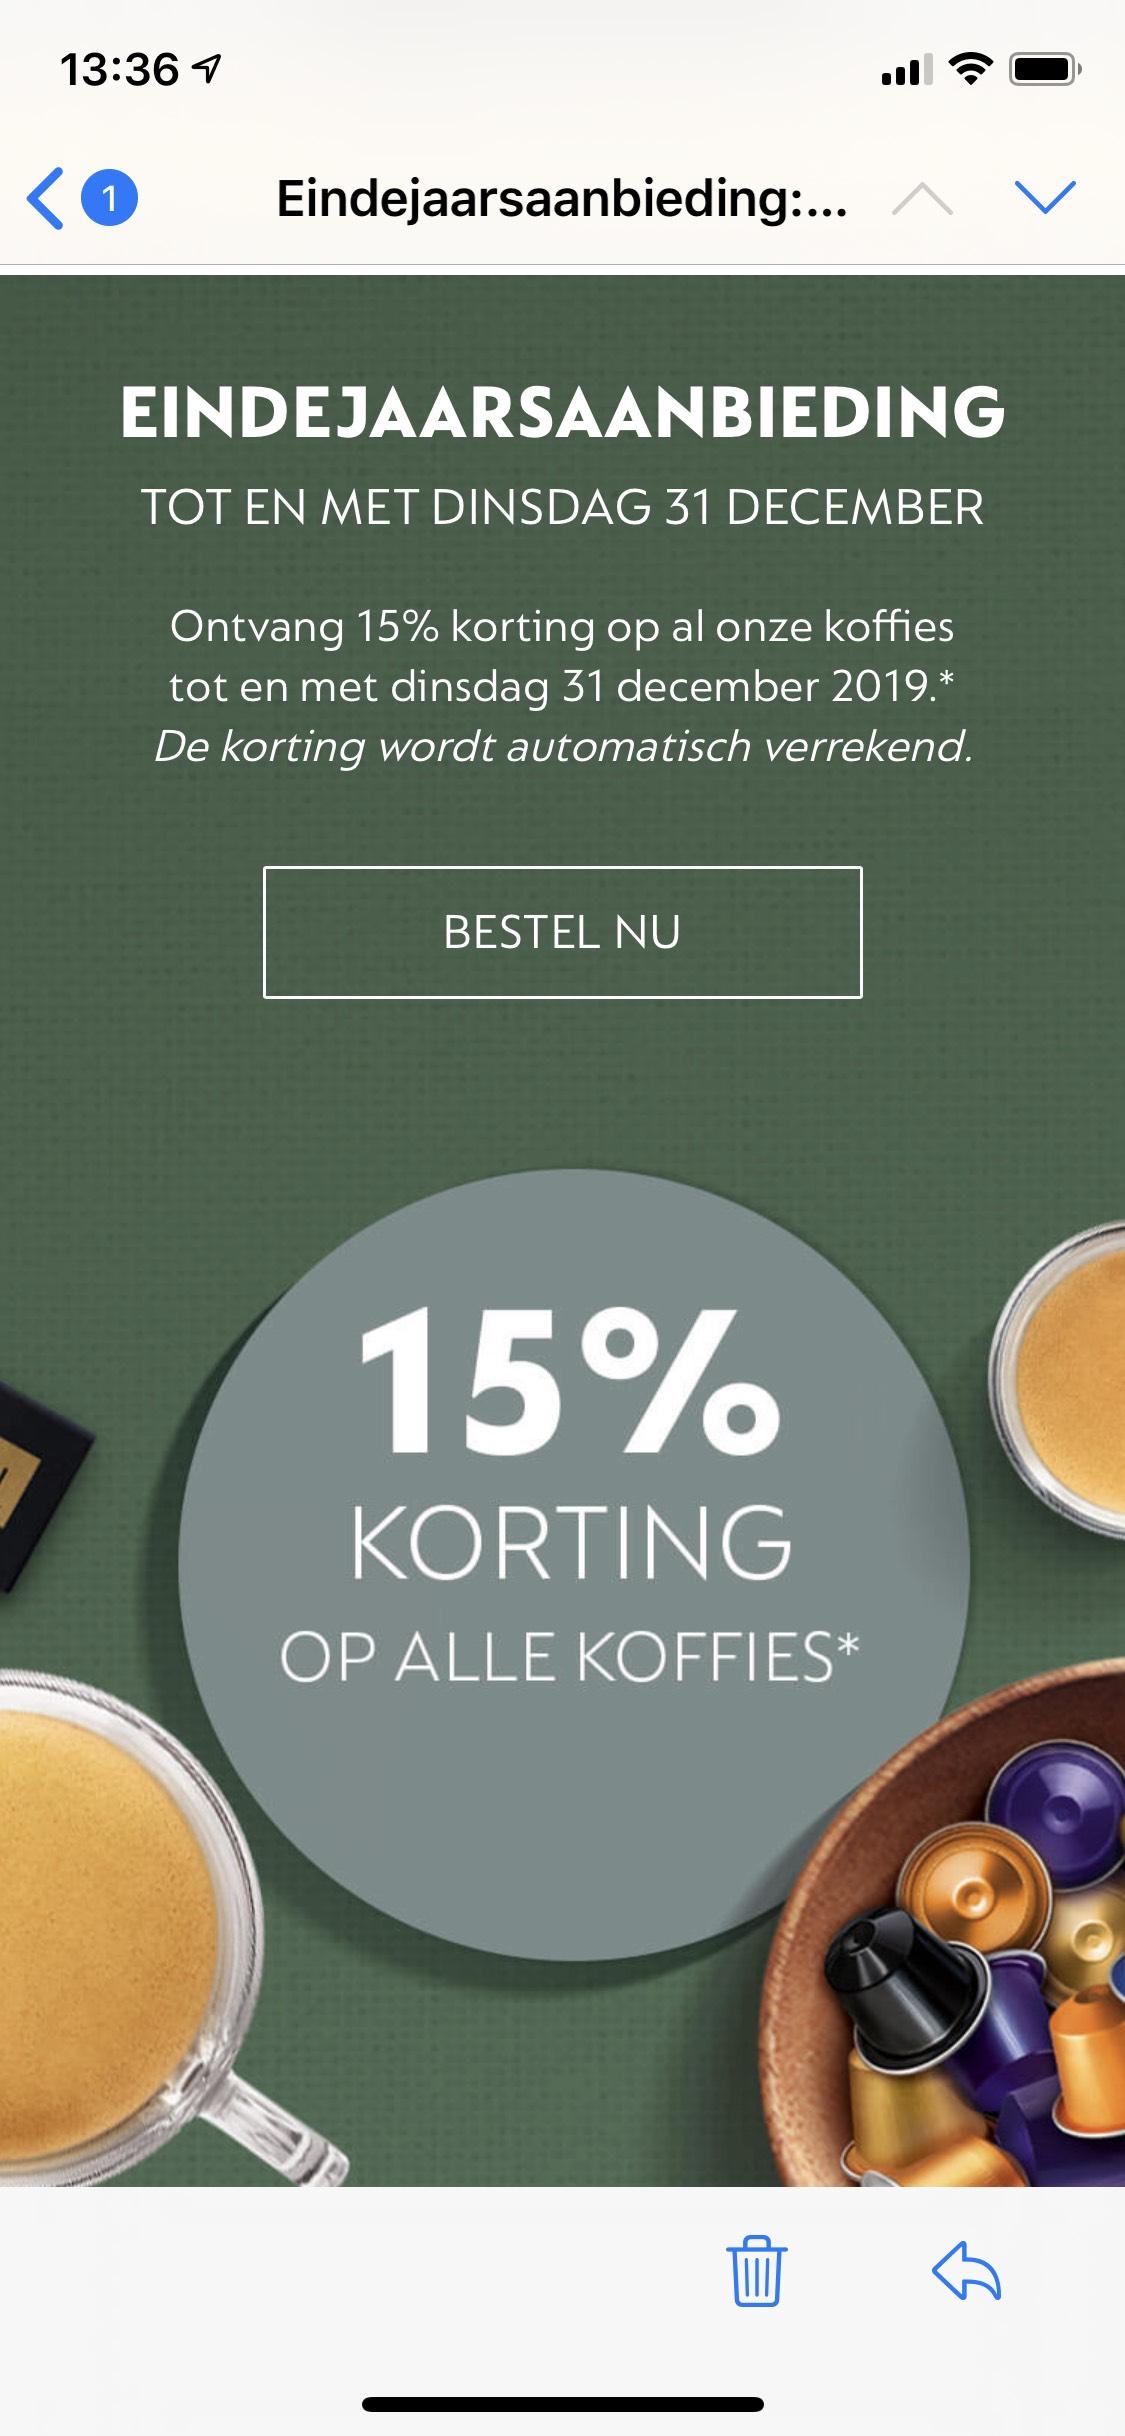 15% korting op alle Nespresso koffies